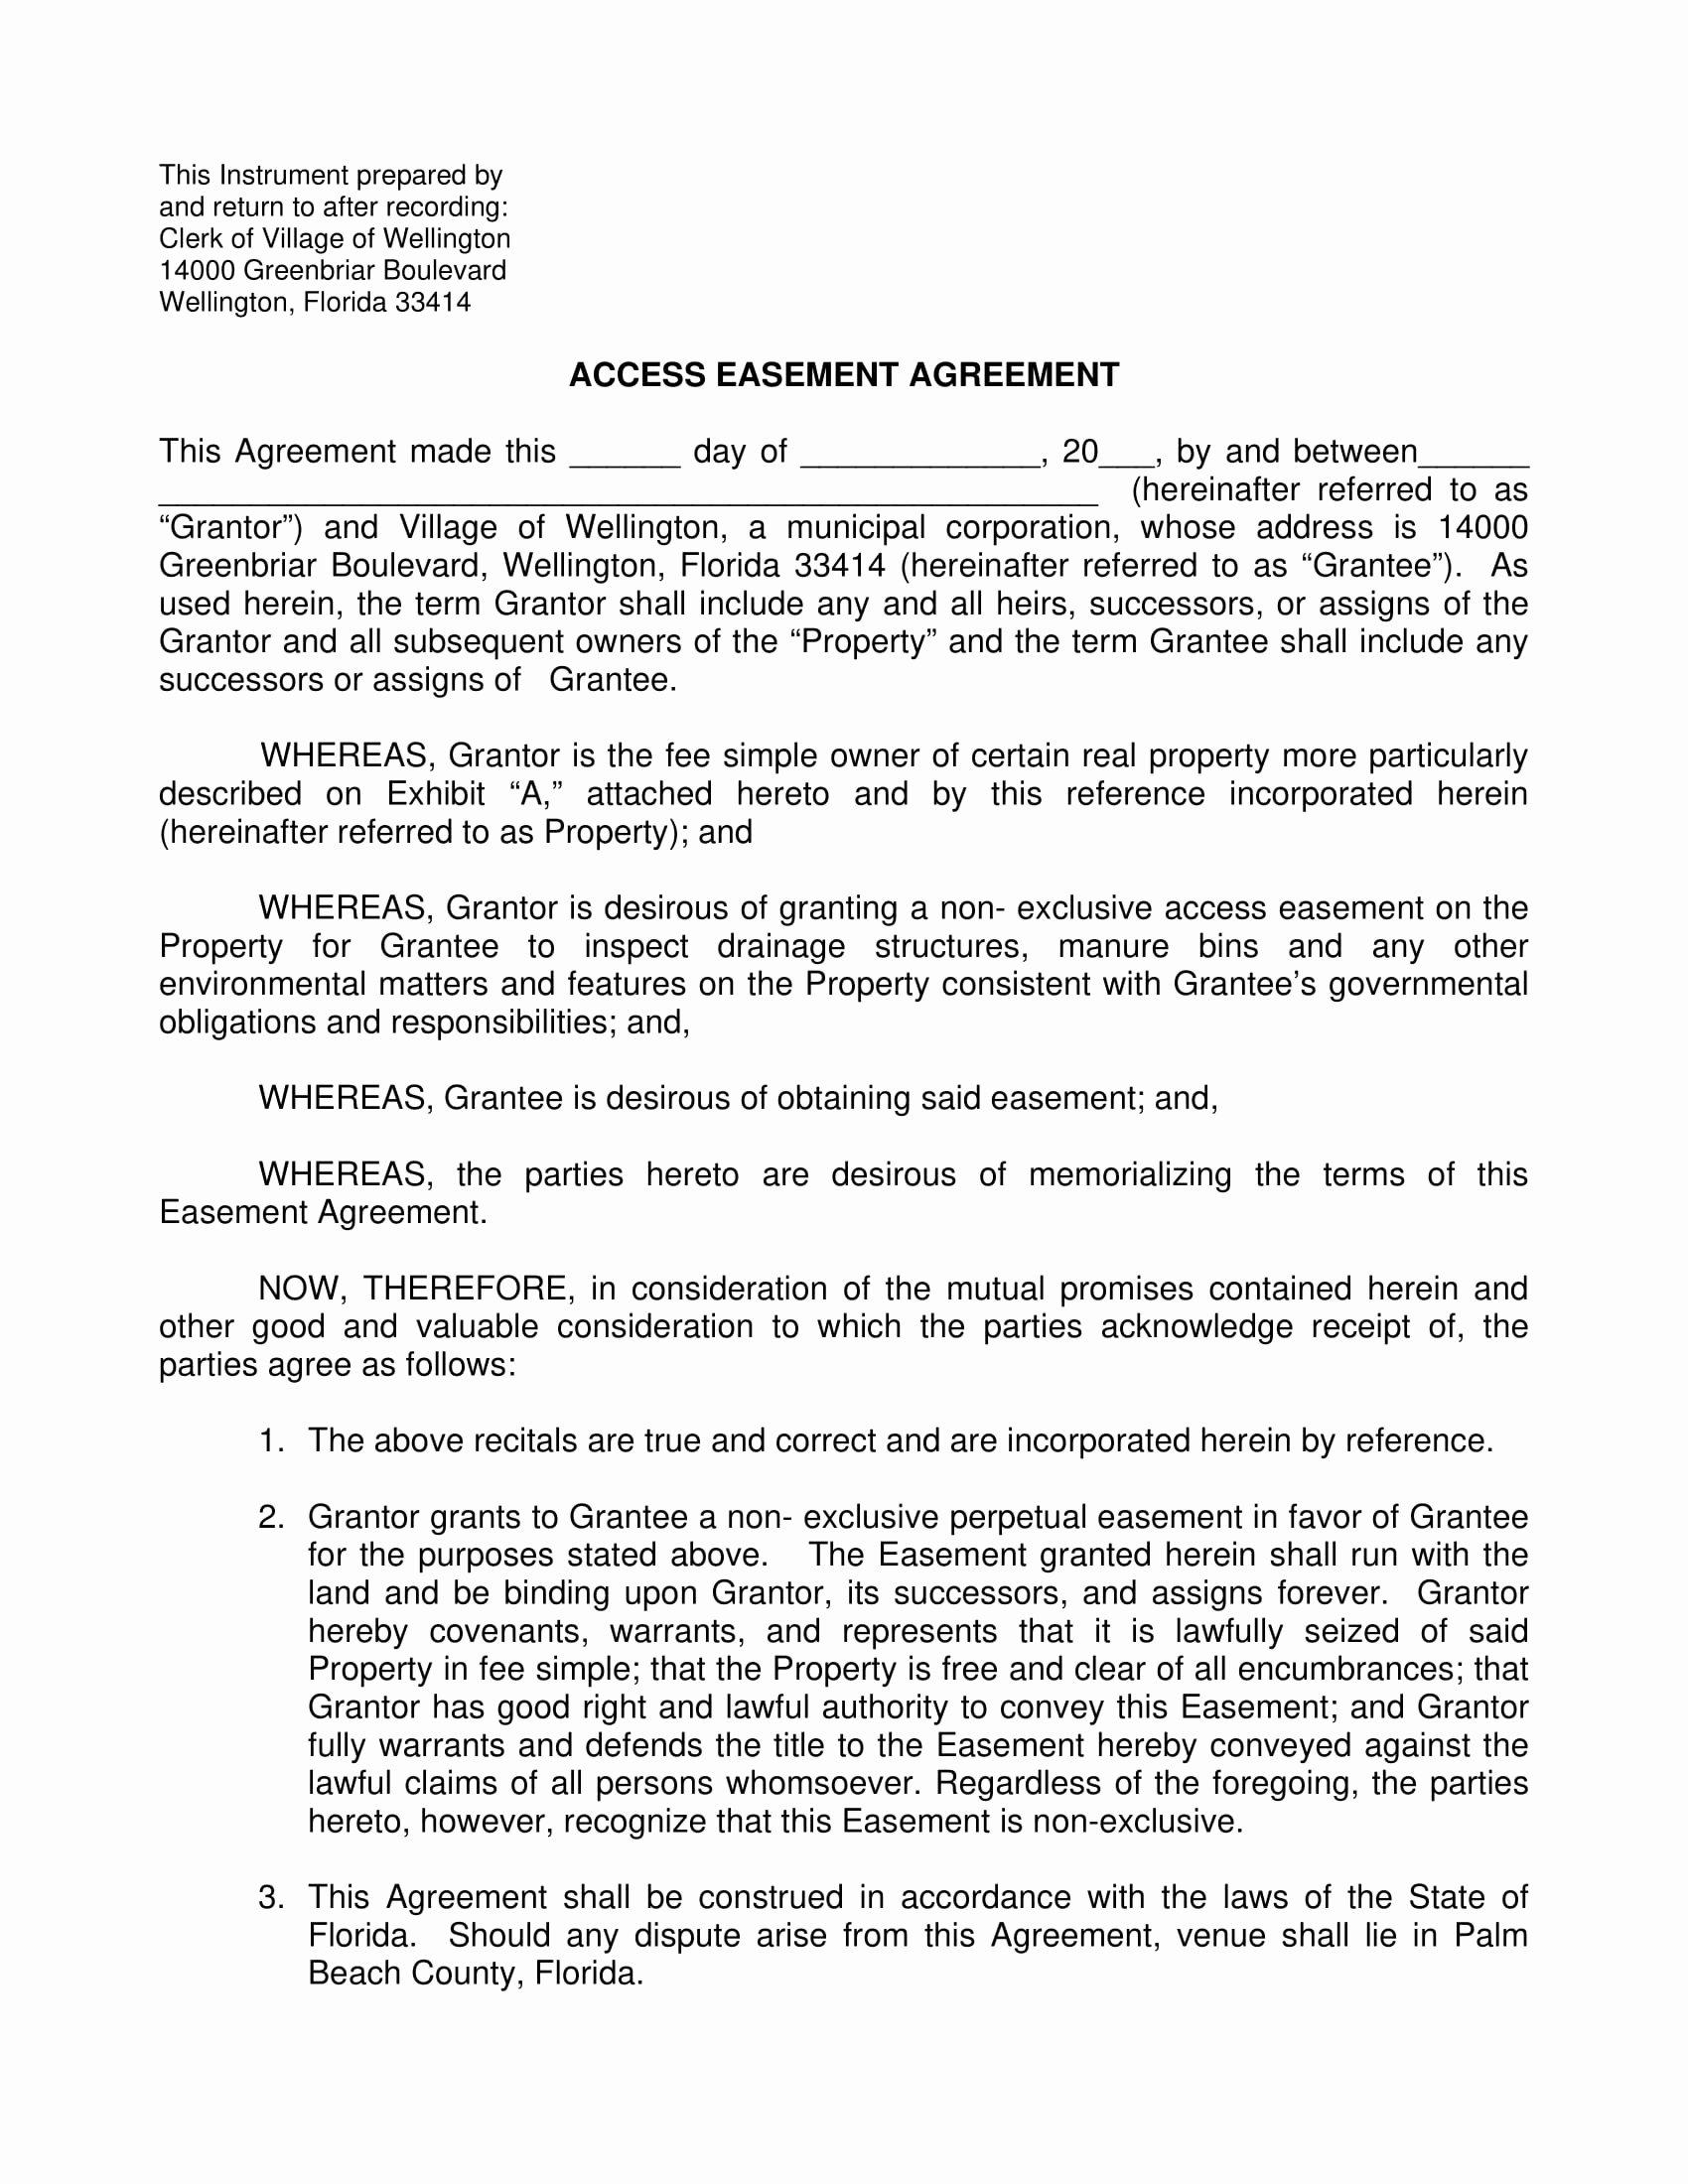 Sample Easement Agreement Unique 10 Easement Agreement Contract forms Pdf